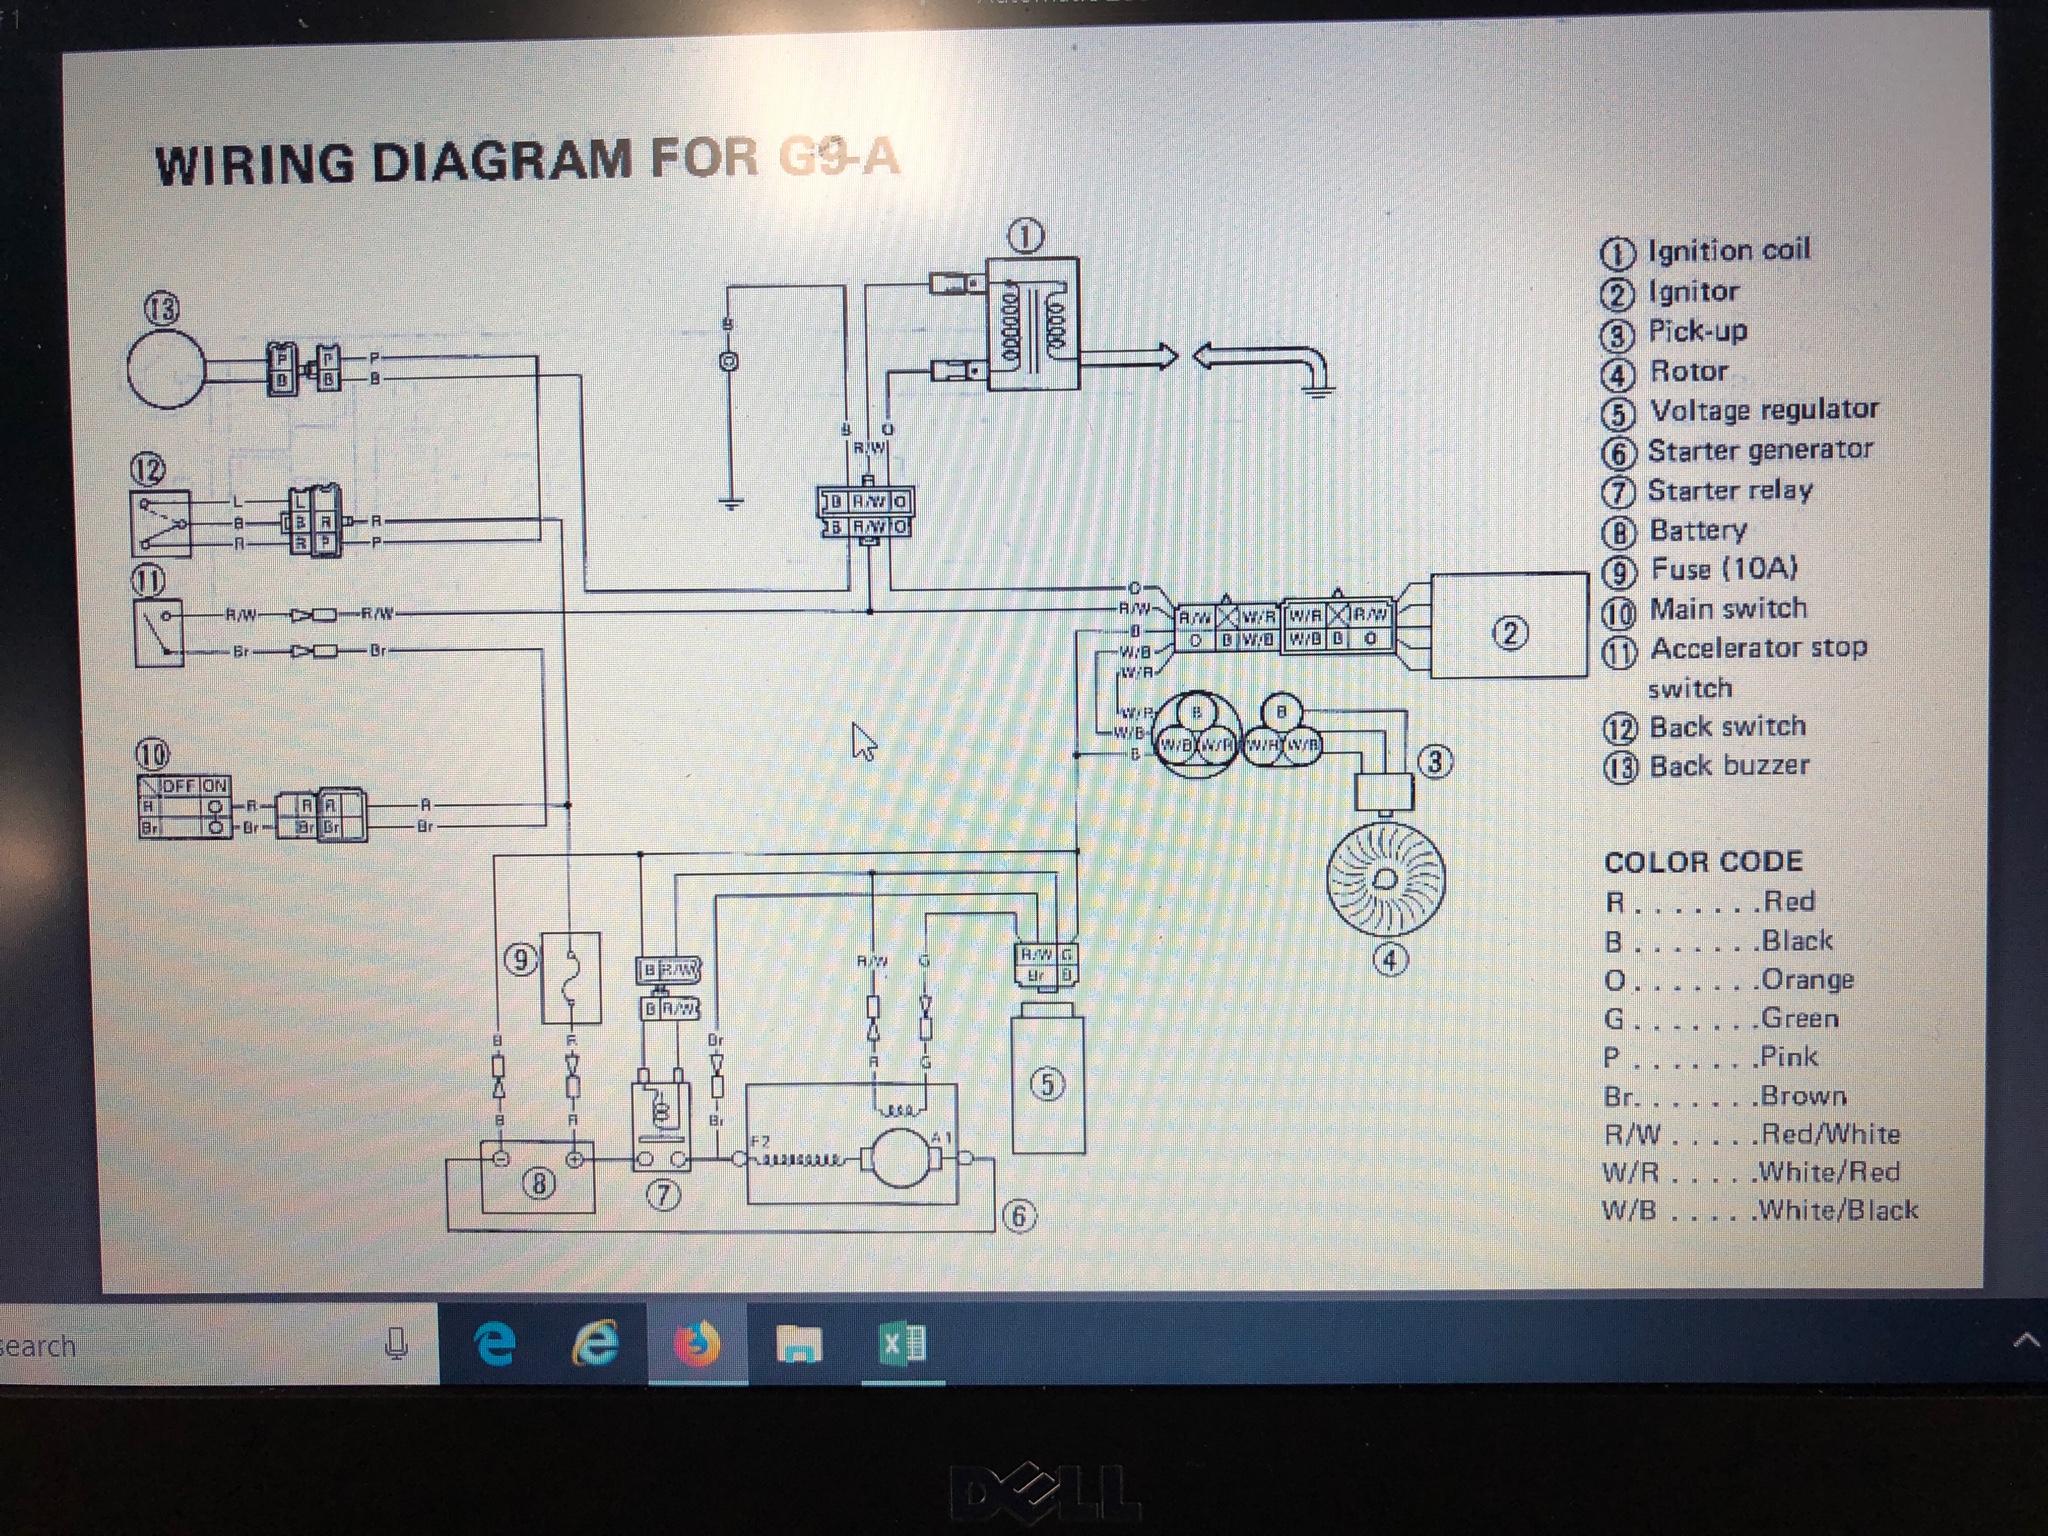 Yamaha G8a Wiring Diagram | Wiring Diagram on yamaha golf cart repair manual, yamaha golf cars, yamaha motorcycle wiring diagrams, yamaha xs650 wiring-diagram, yamaha ydre wiring-diagram, yamaha golf cart serial number, yamaha wiring-diagram g29, yamaha parts diagram, yamaha g1 golf cart, golf cart electrical system diagram, club car wiring diagram, yamaha g9 golf cart, yamaha electric golf cart, yamaha g2 golf cart, yamaha marine part 703-82563-02, yamaha golf cart generator, yamaha golf cart parts, yamaha golf cart turn signals, yamaha g9 wiring-diagram, yamaha golf cart wheels,